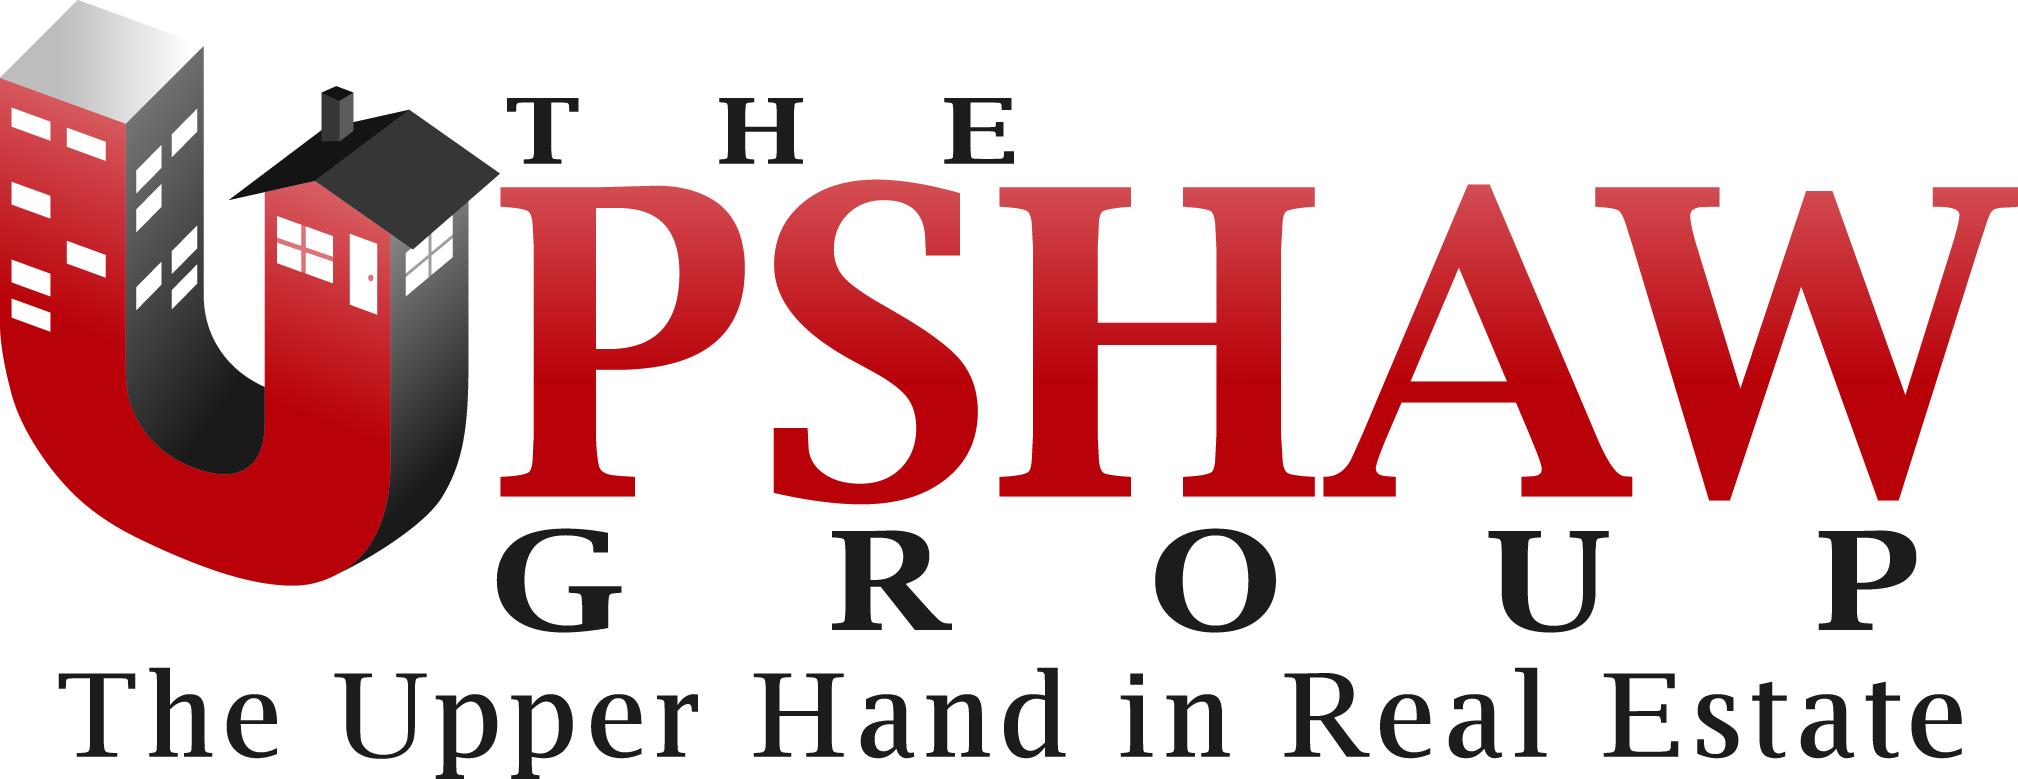 Upshaw Group Logo